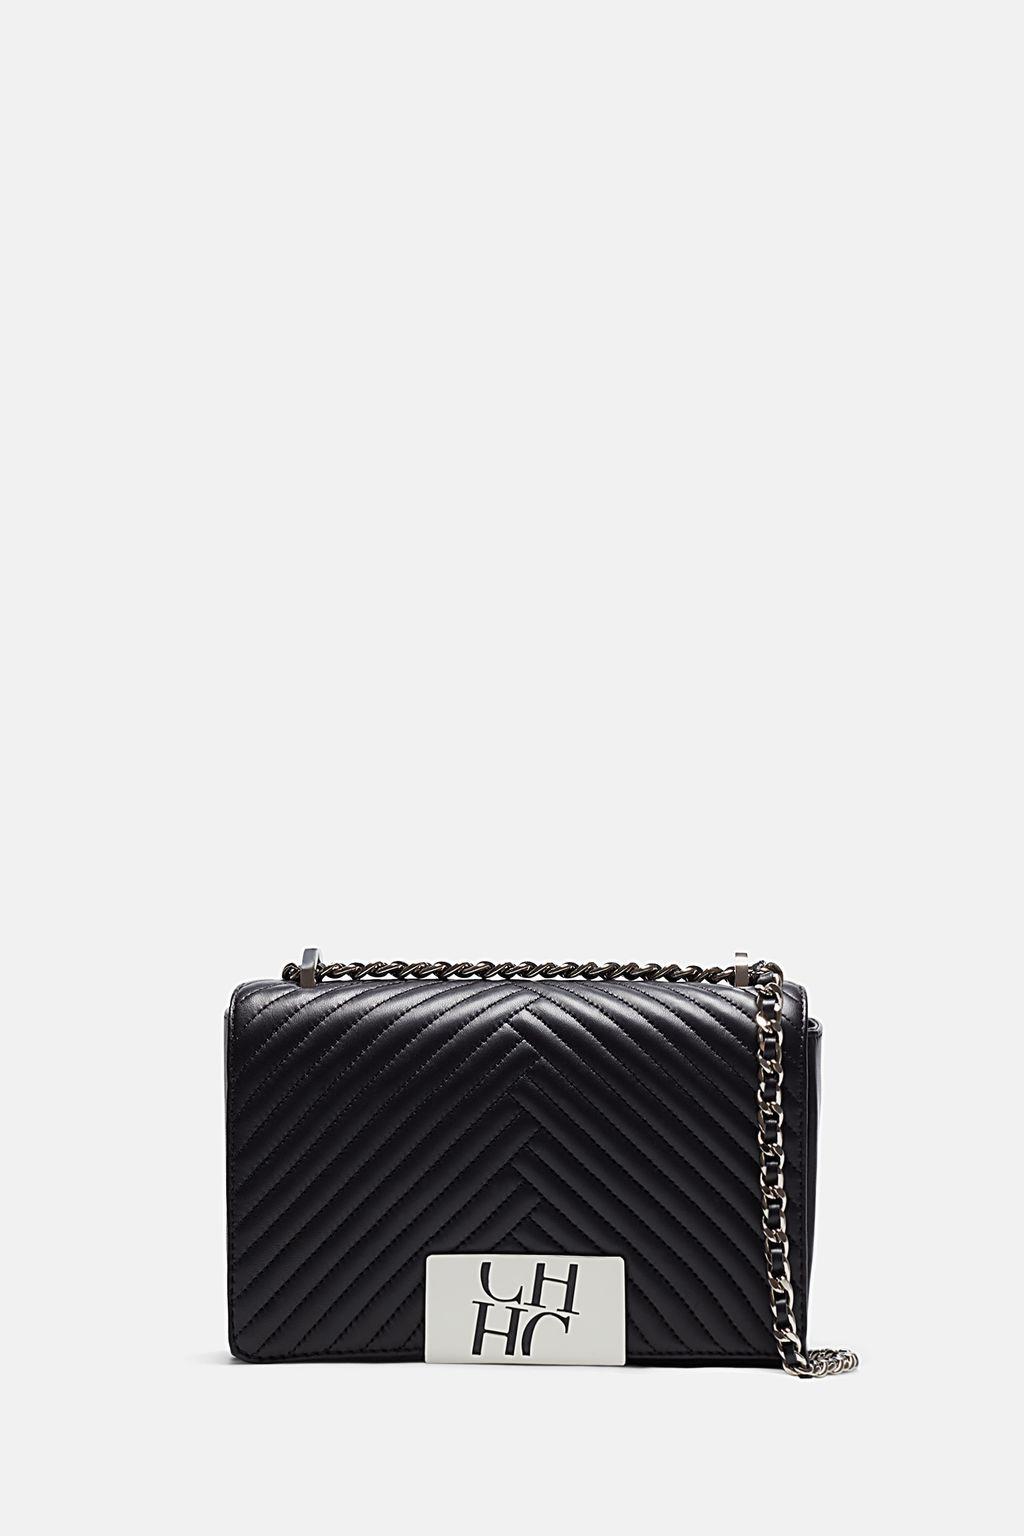 Bimba 9.0 | Small shoulder bag